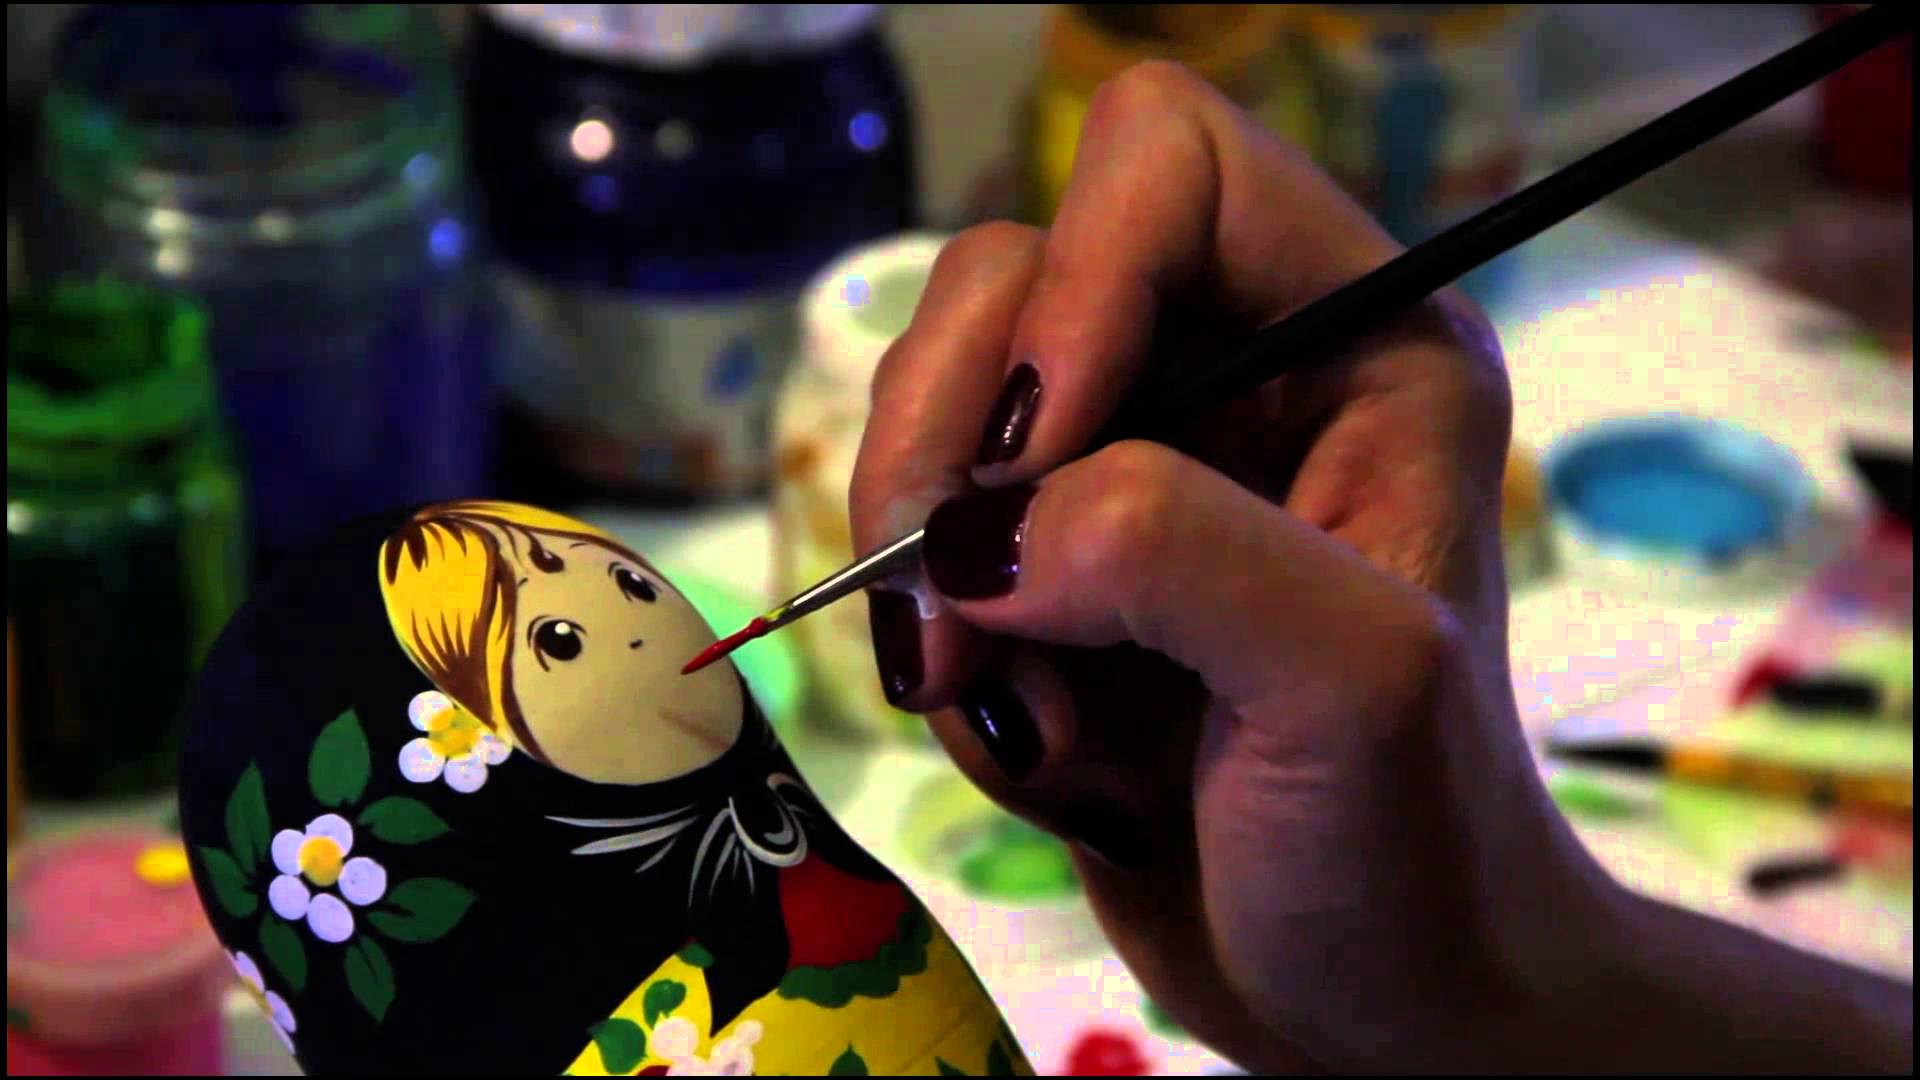 Matryoshka Doll/Nesting doll in Sergiev Posad